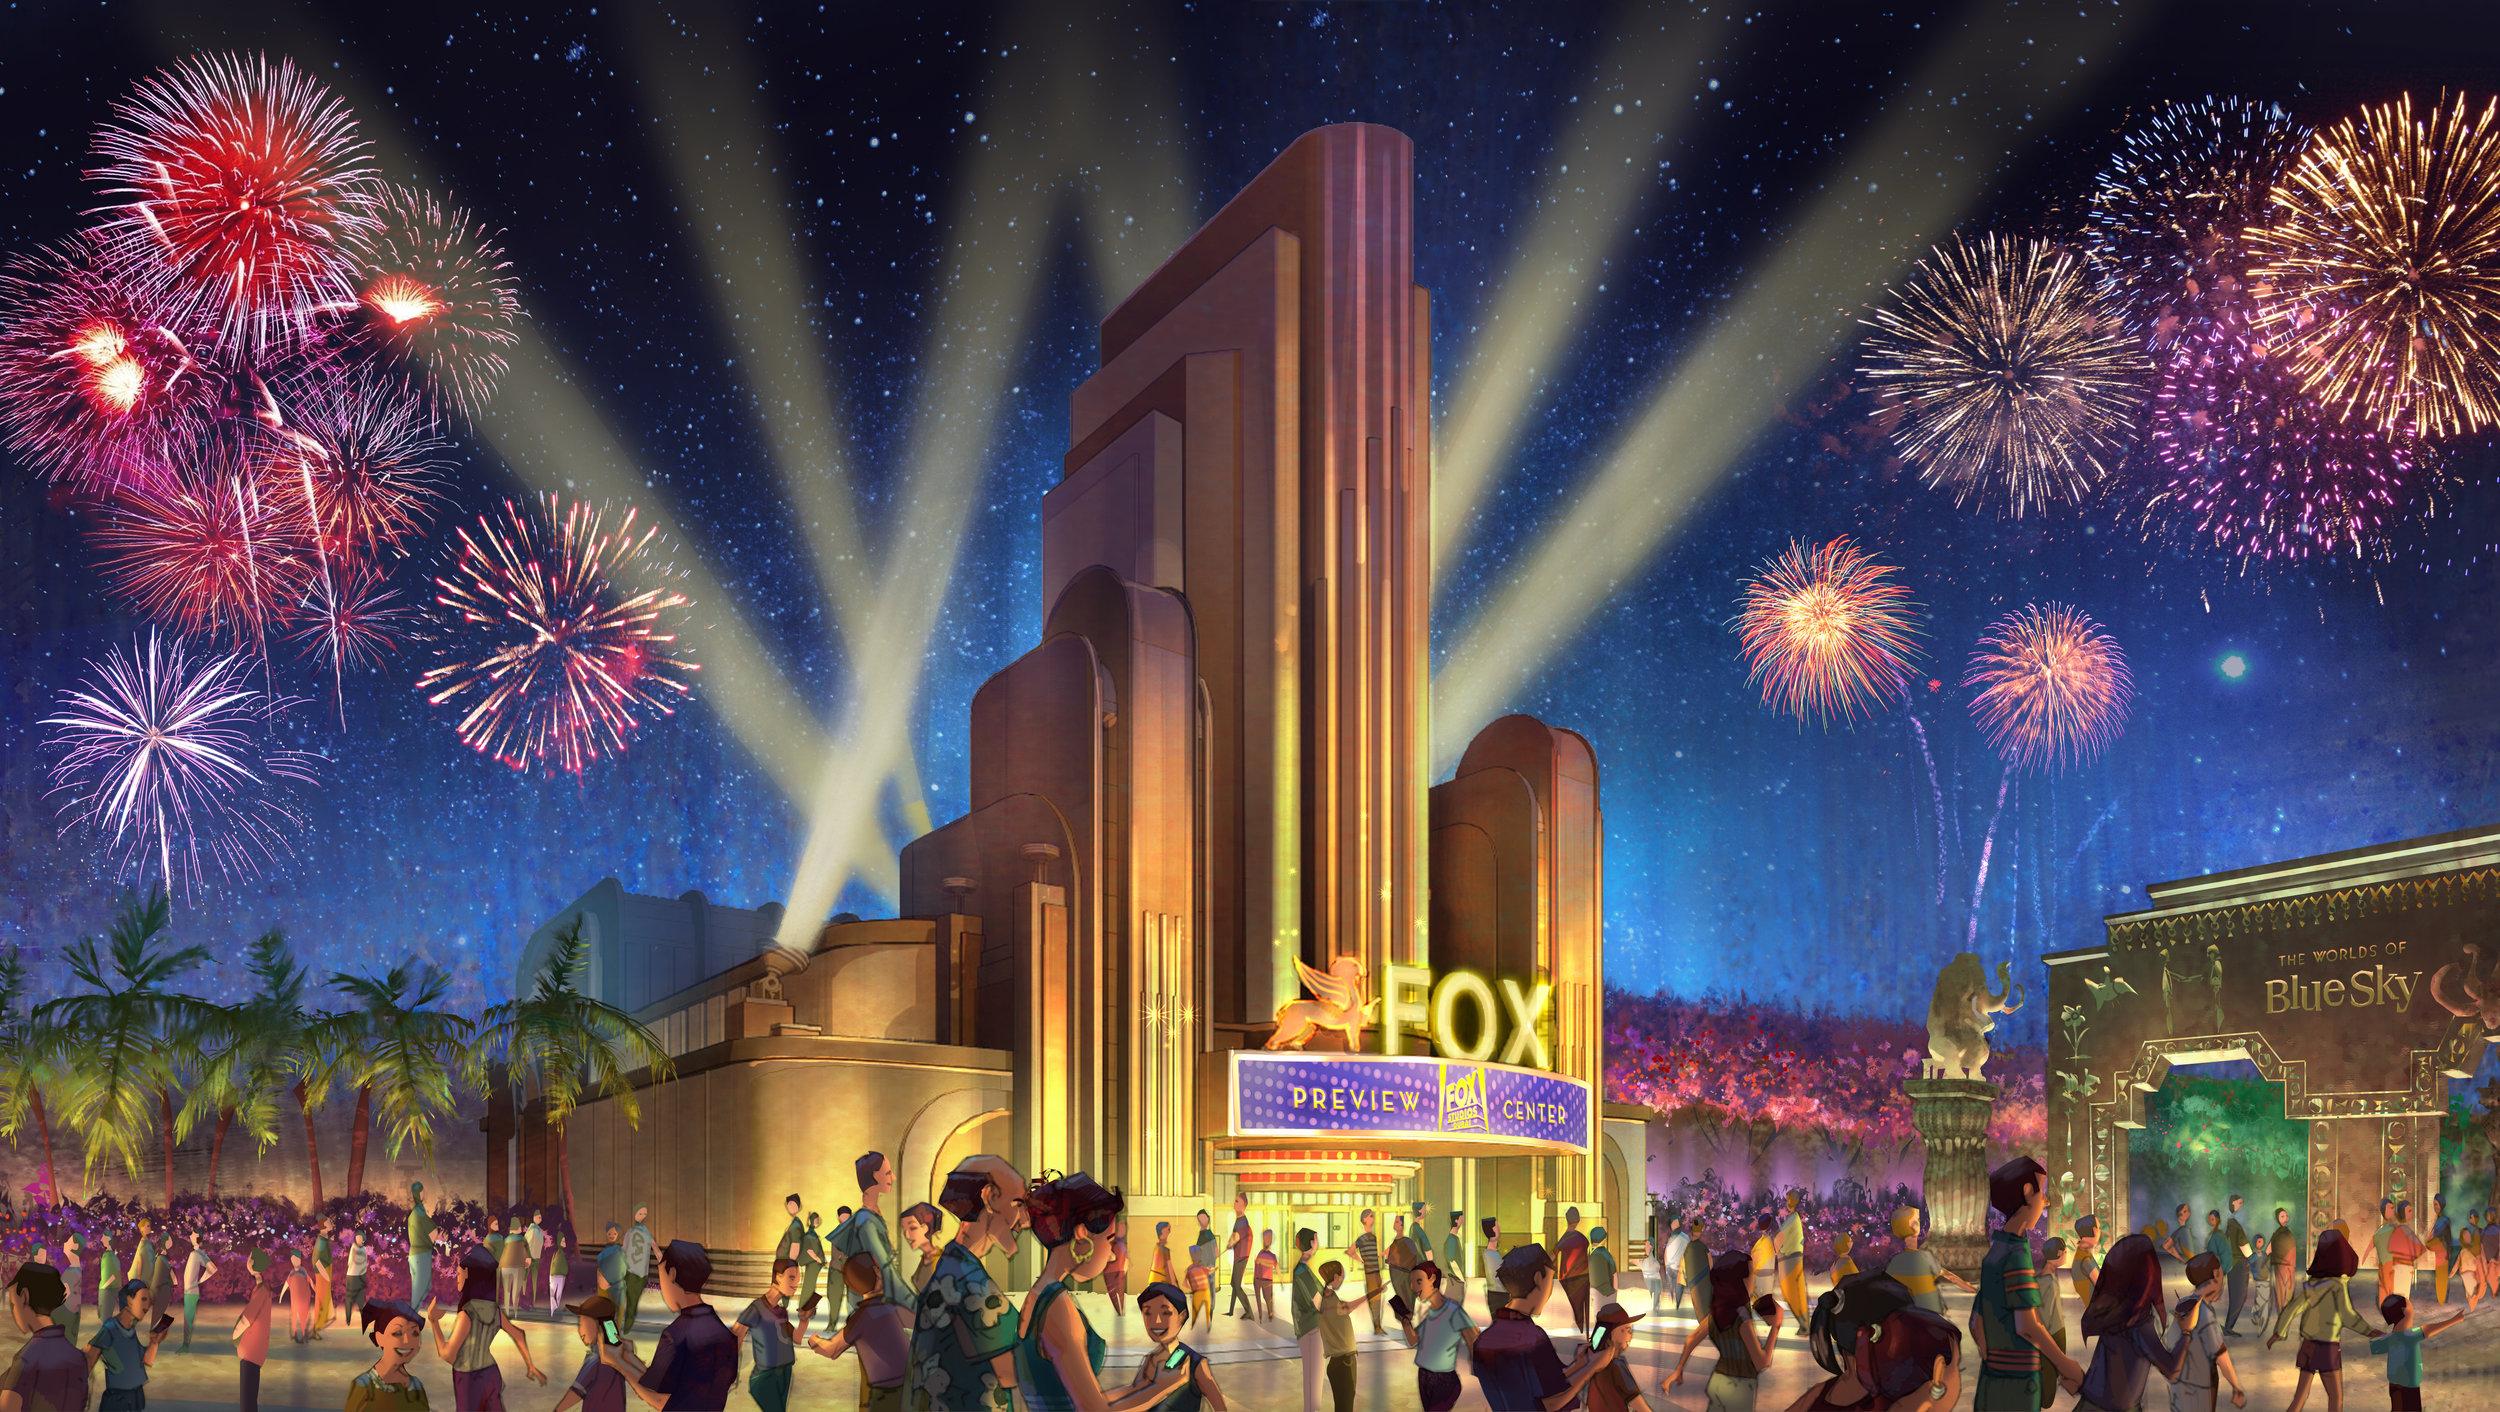 Duba_Fox_Theater_11A_Tommy_3_layer update.jpg